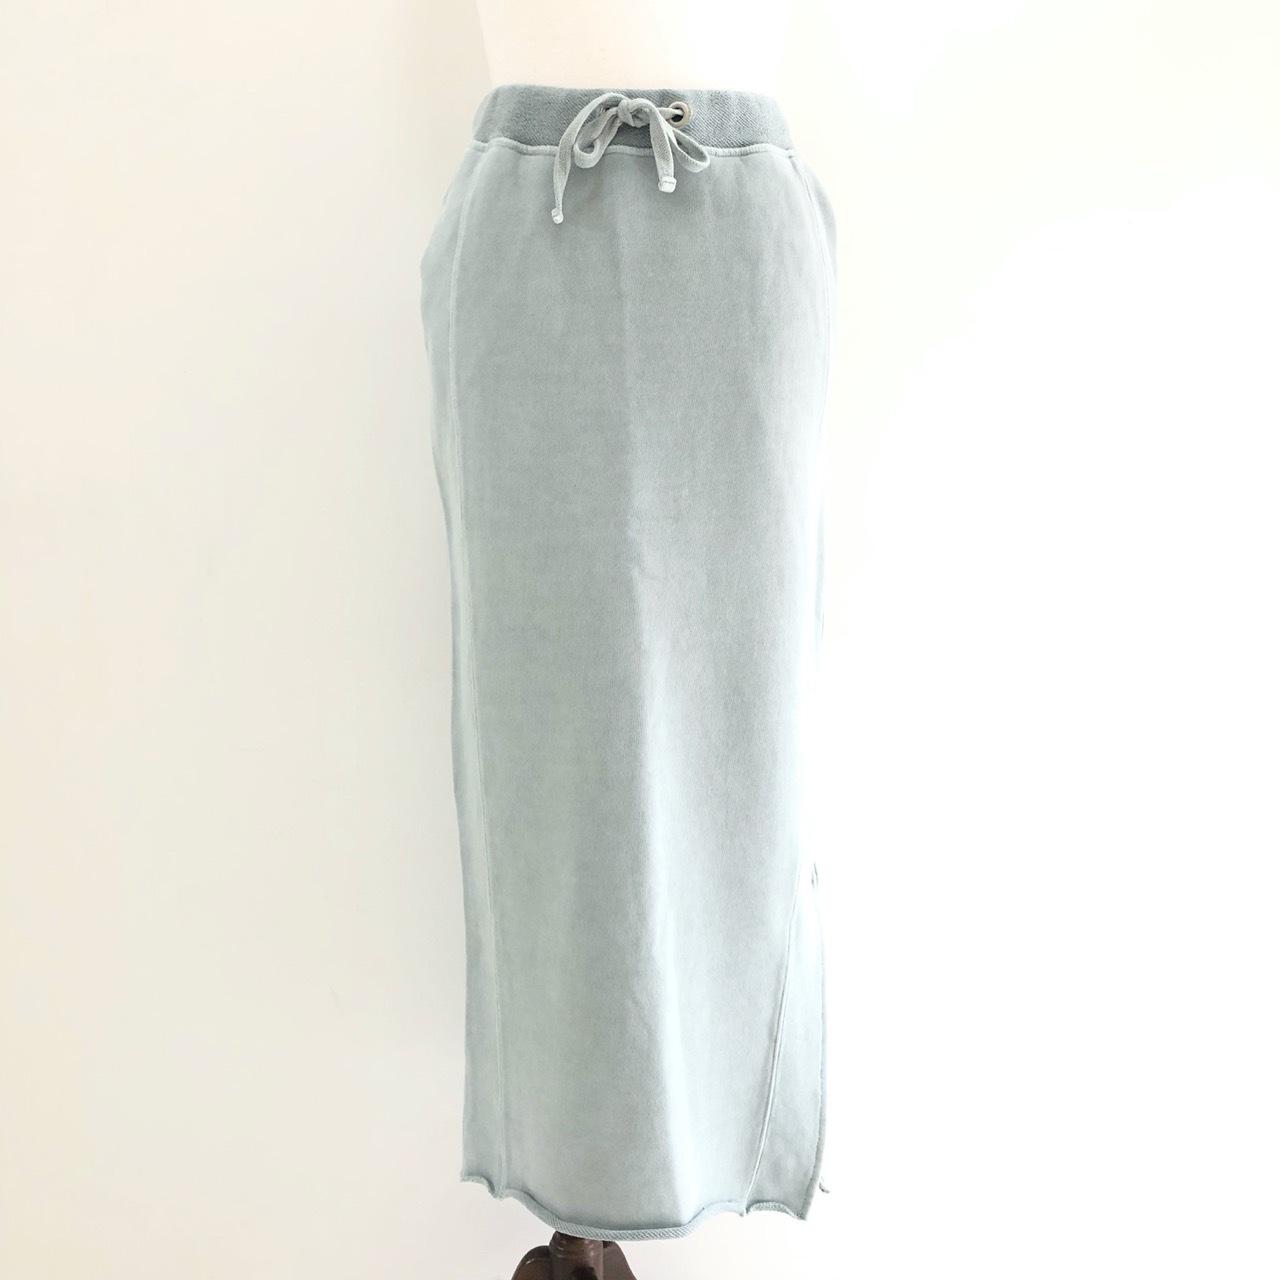 【 Flamingo Firm 】- 150159 - スカート